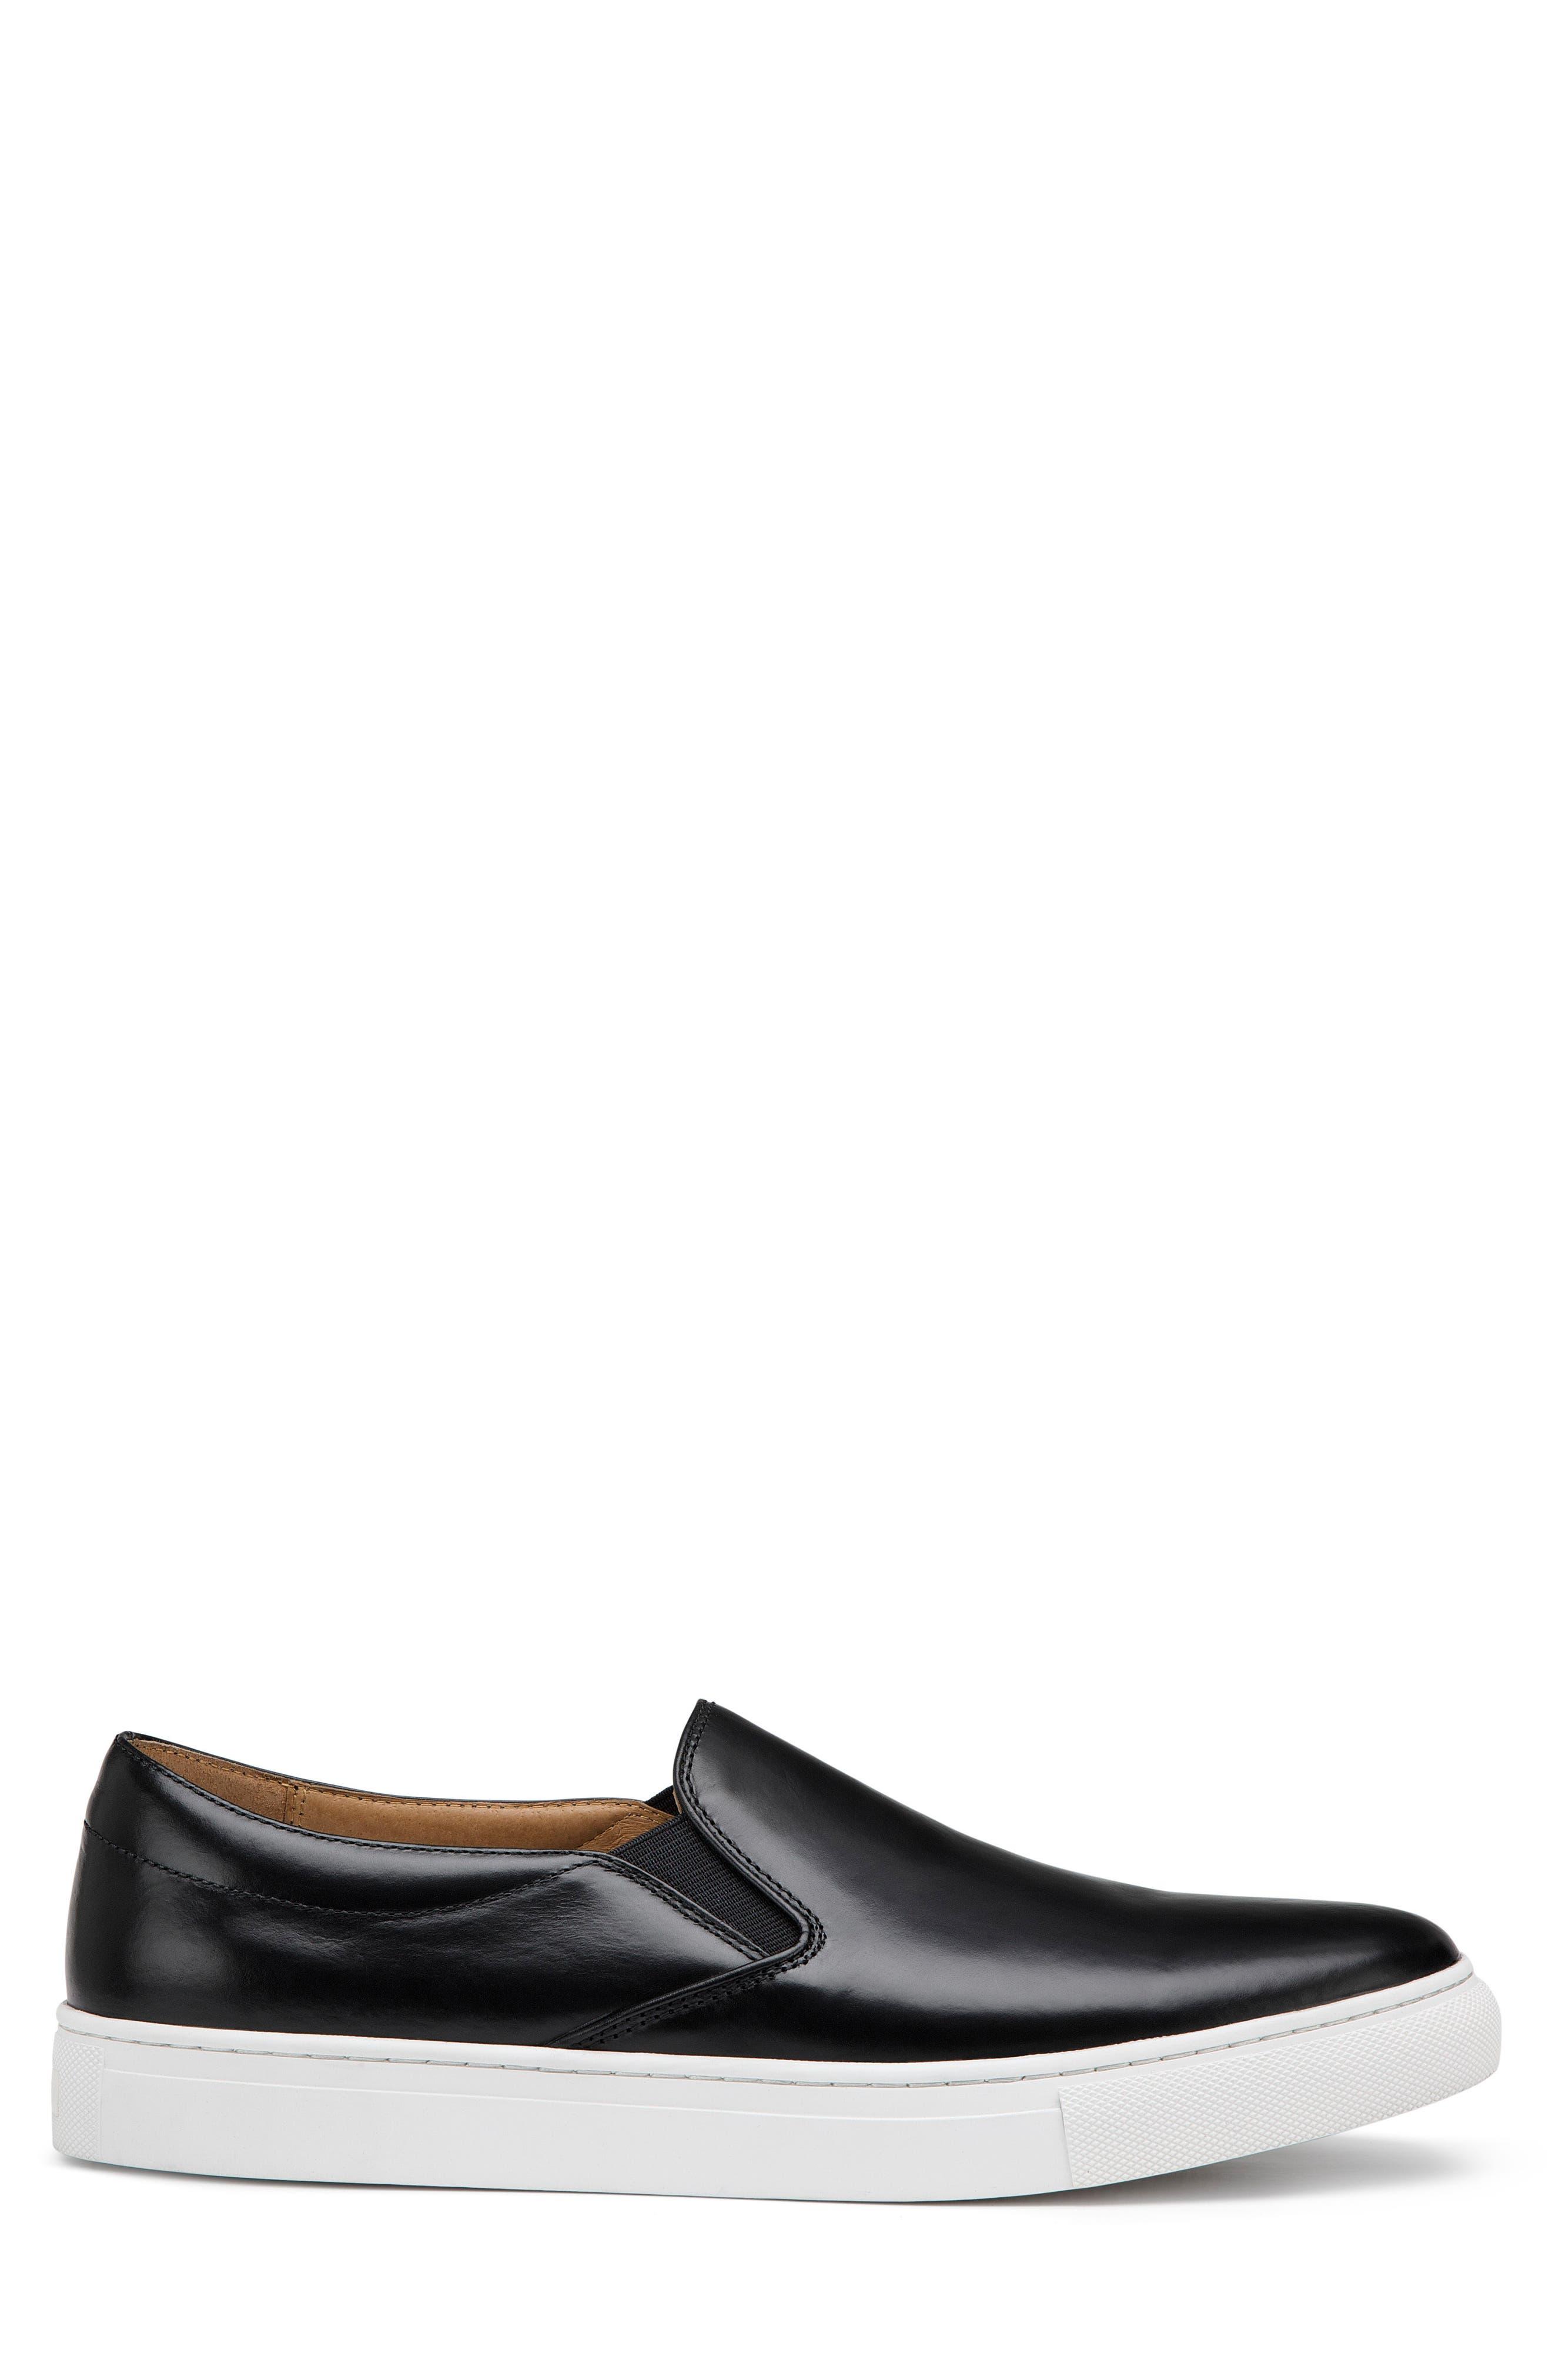 Alex Slip-On Sneaker,                             Alternate thumbnail 3, color,                             Black Leather